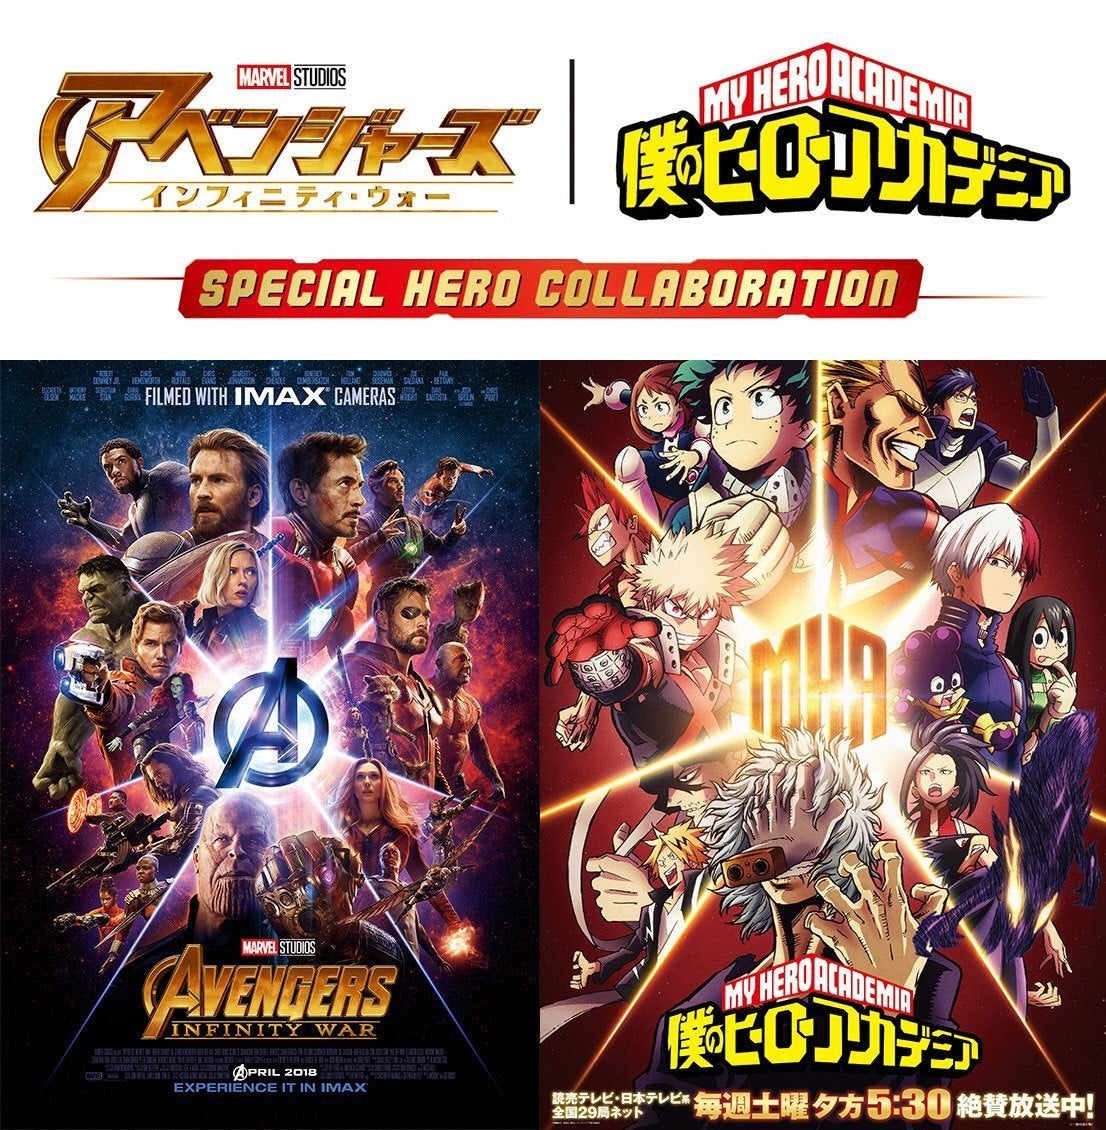 'My Hero Academia' And 'Avengers: Infinity War' Reveal